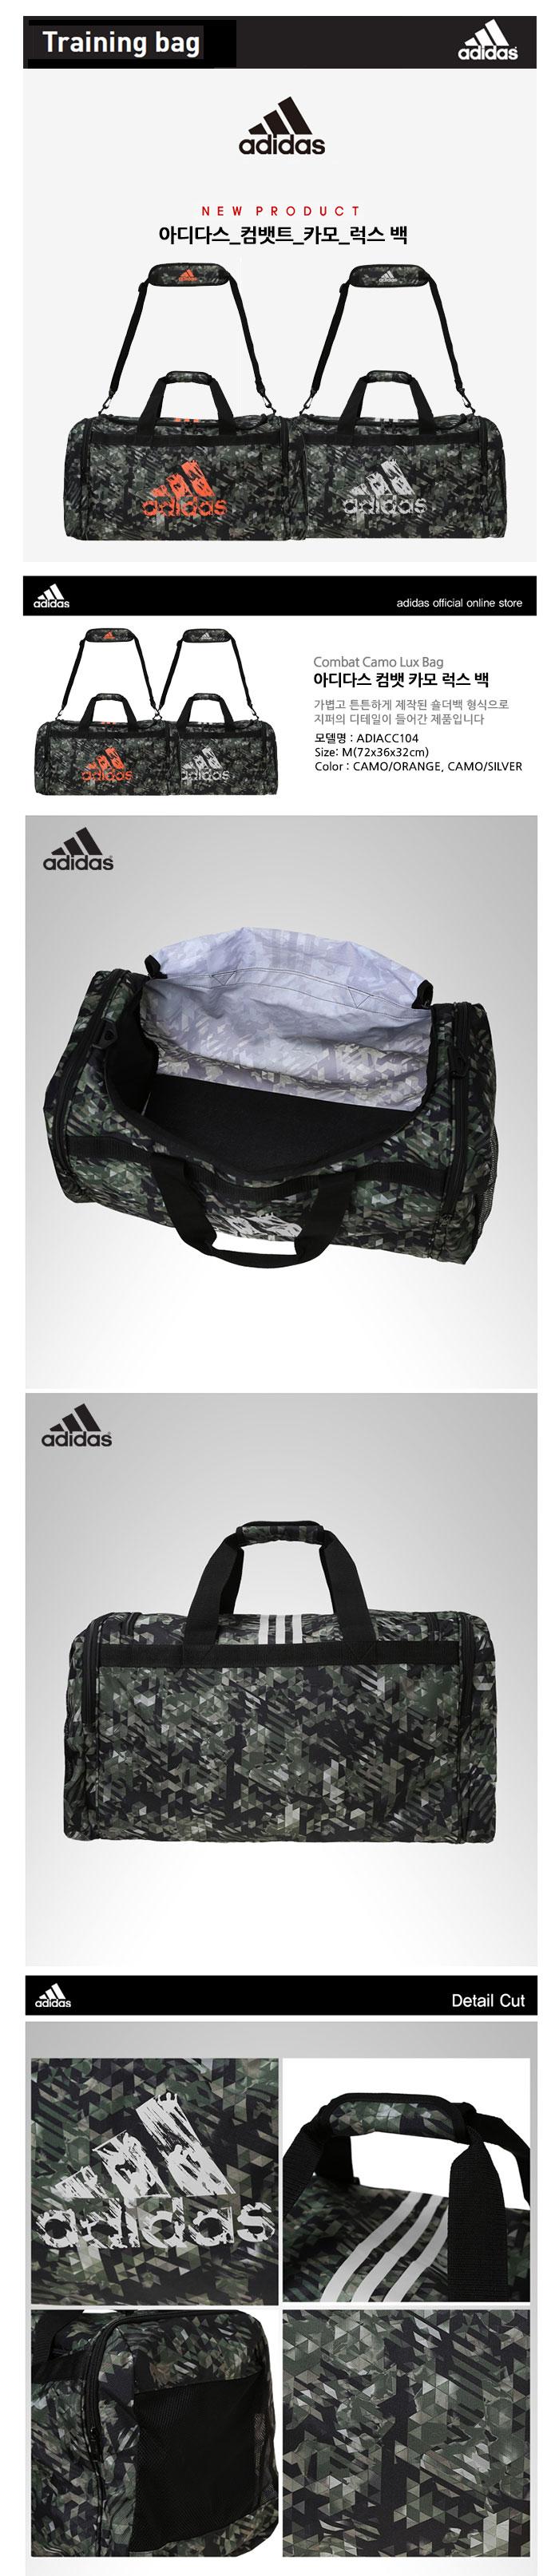 adidas martial arts equipment bags//Taekwondo equipment Bags//Combat Camo Lux bag